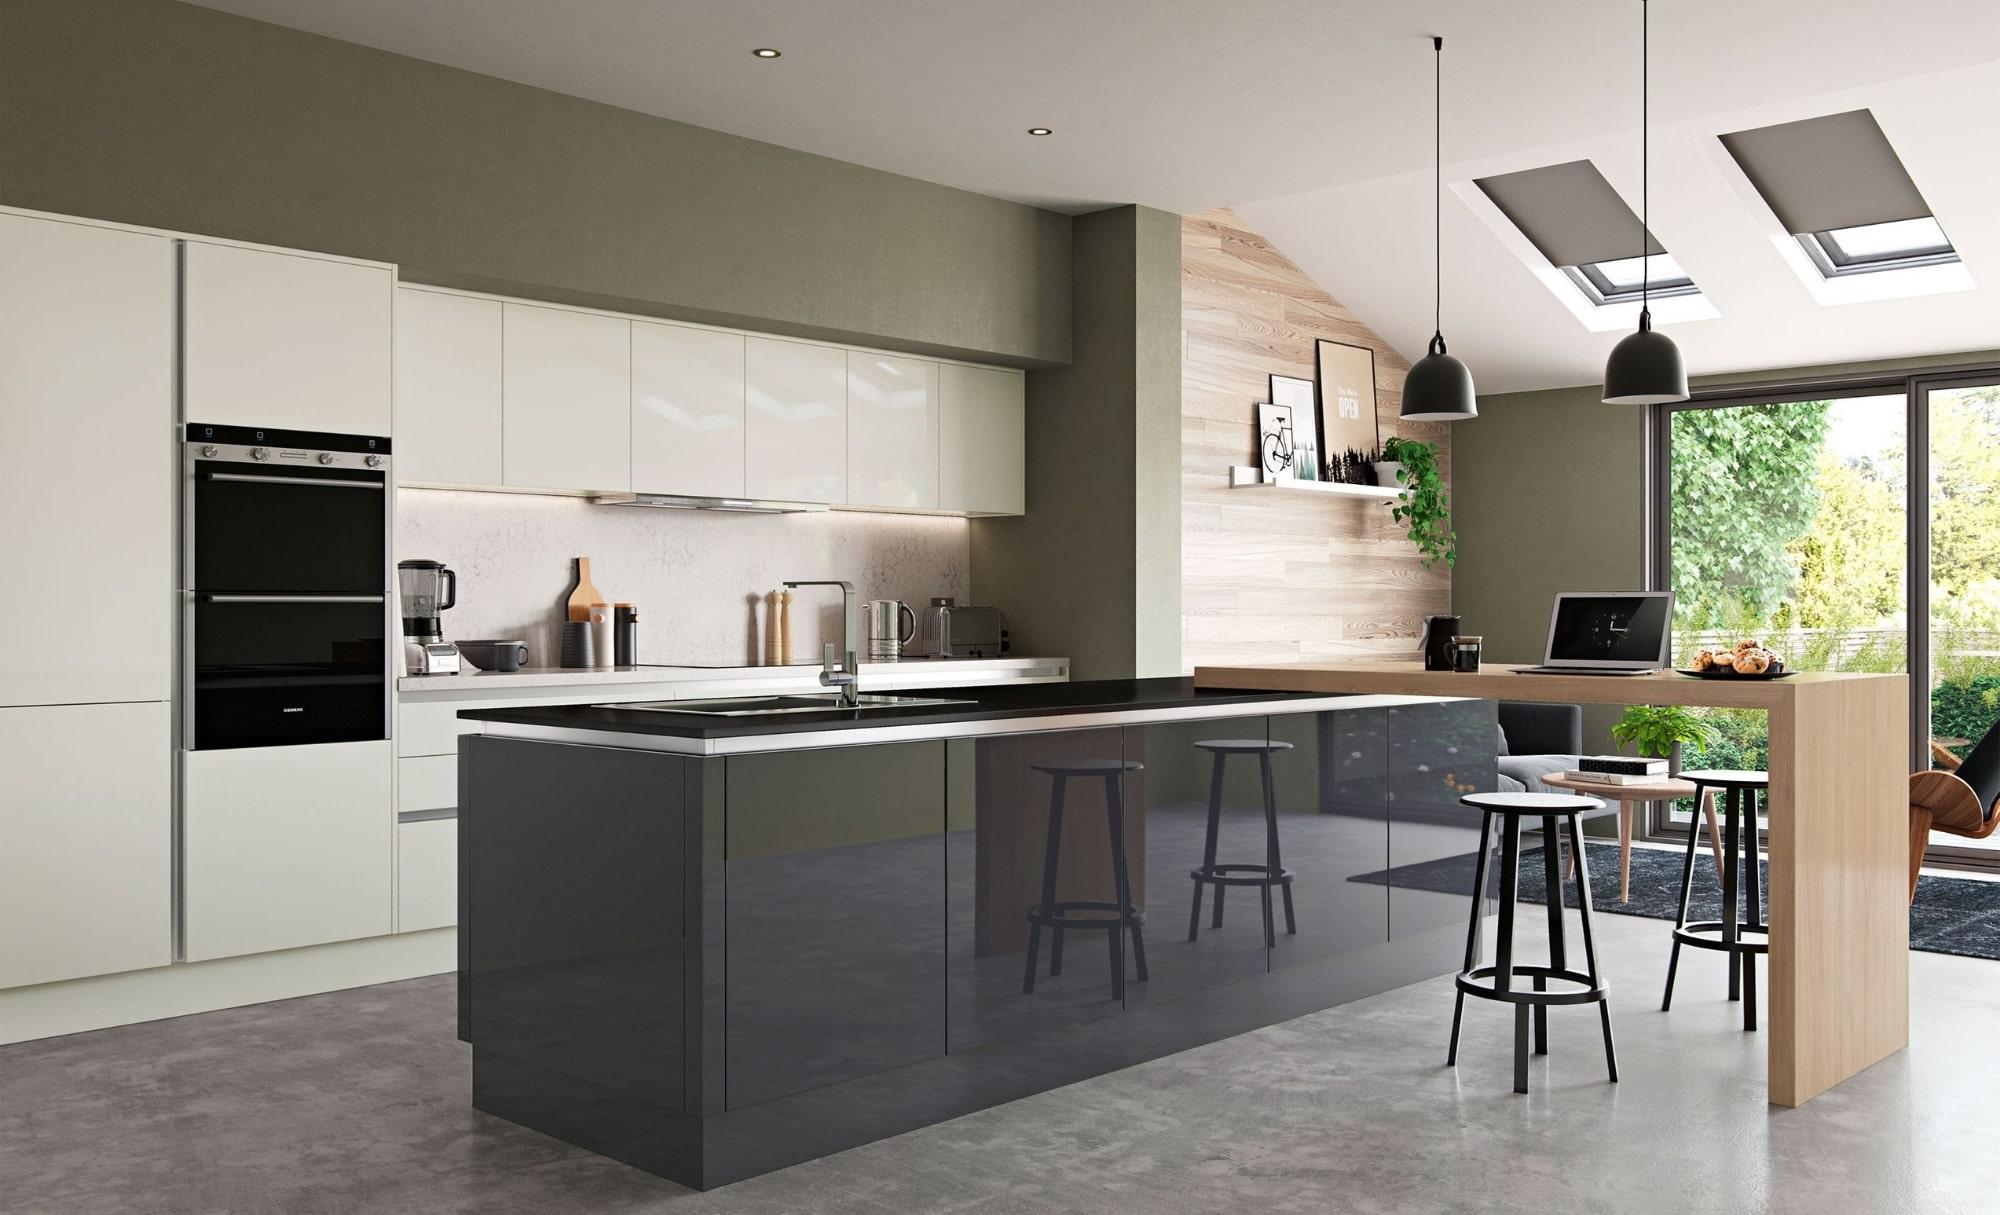 Modern Contemporary Zola Gloss Porcelain Graphite Kitchen - Kitchen Design - Alan Kelly Kitchens - Waterford